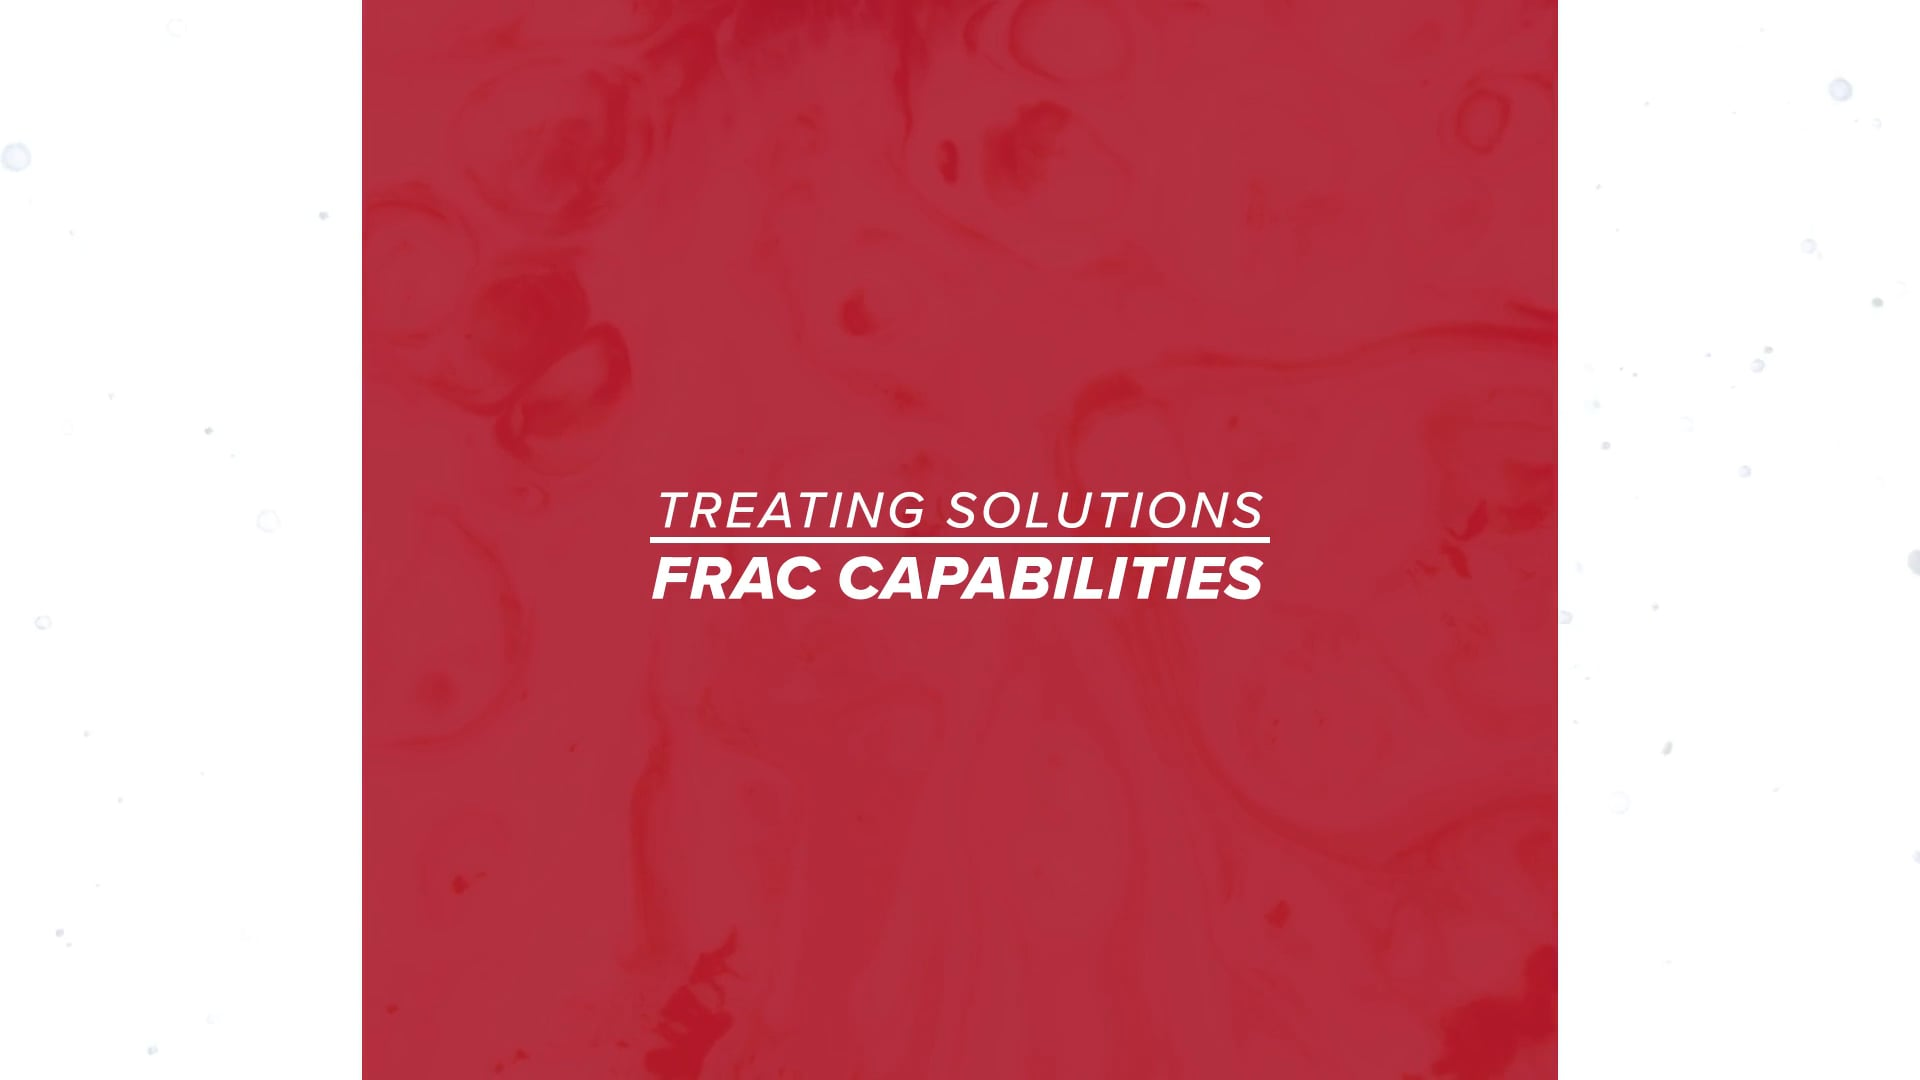 PureChem Services - Frac Capabilities